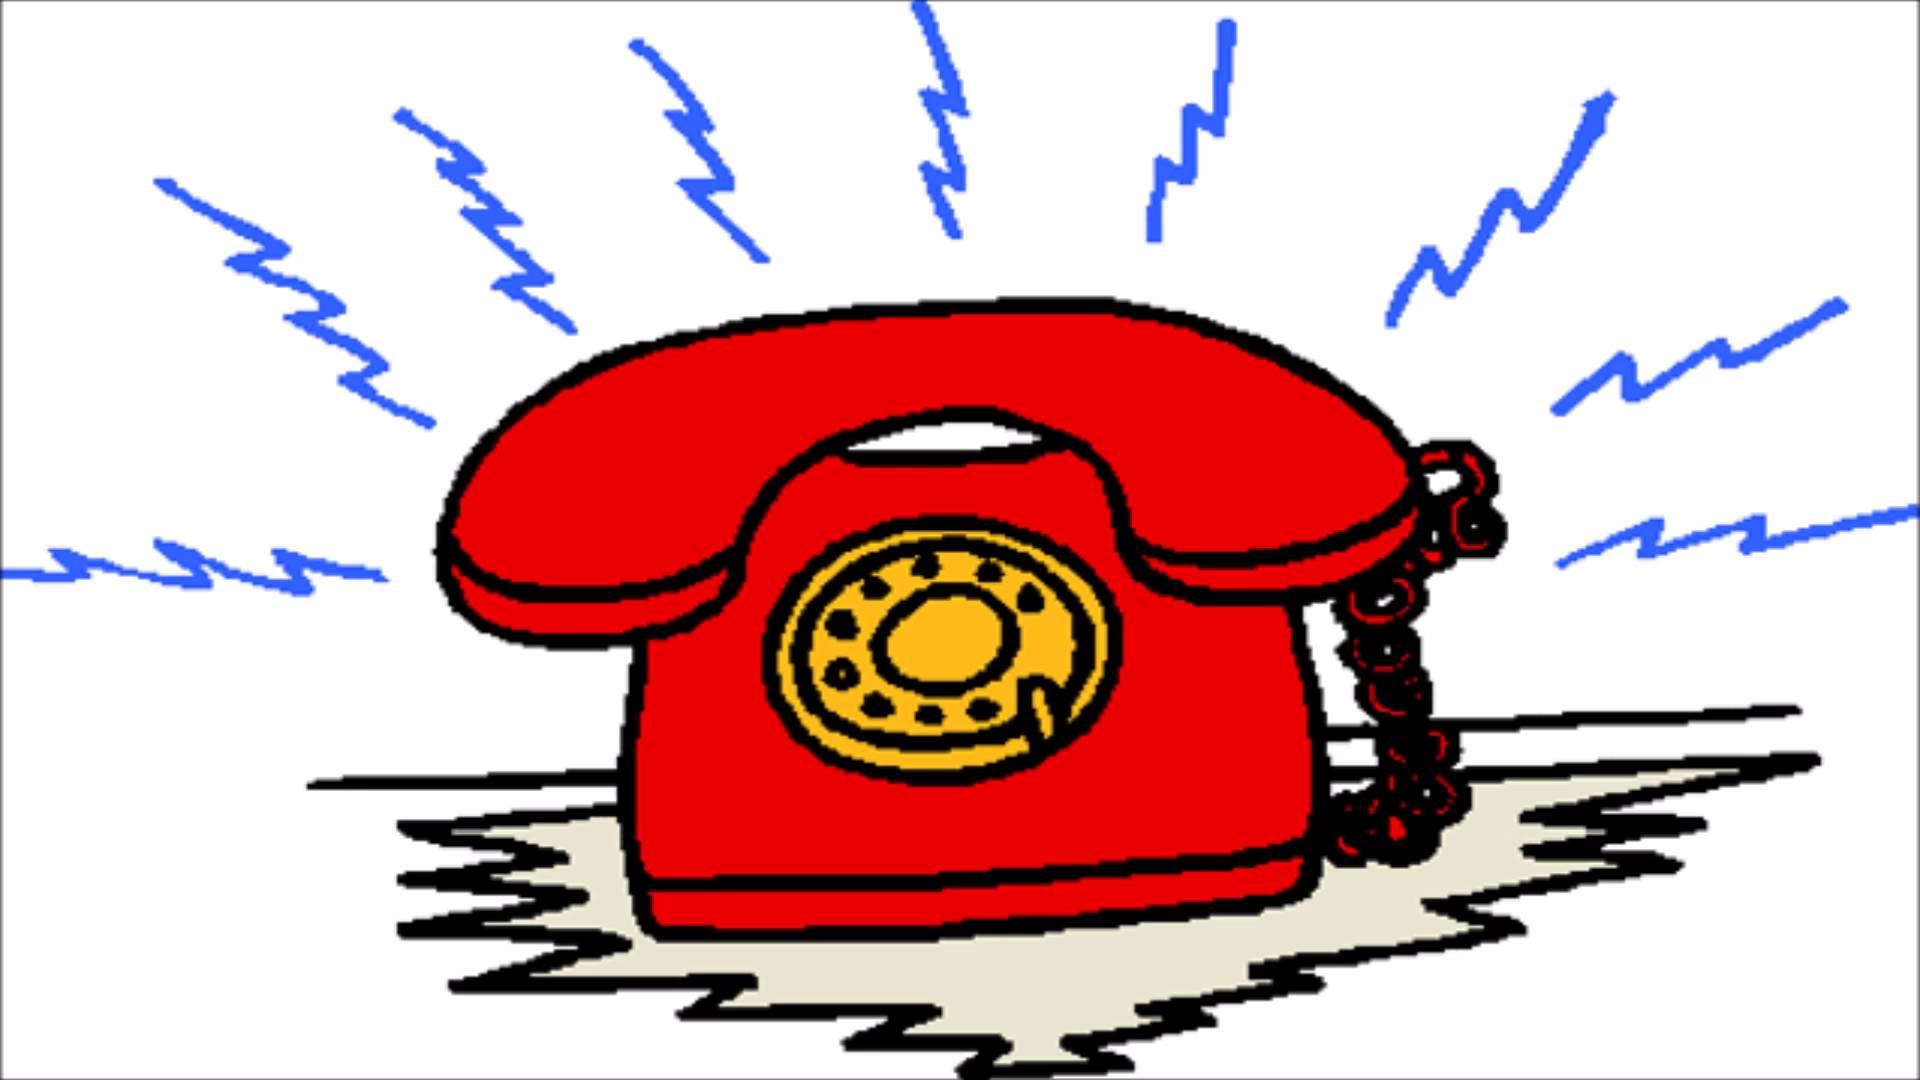 Clipart of animated phone ringing freeuse download Phone Animation Clipart   Free download best Phone Animation Clipart ... freeuse download